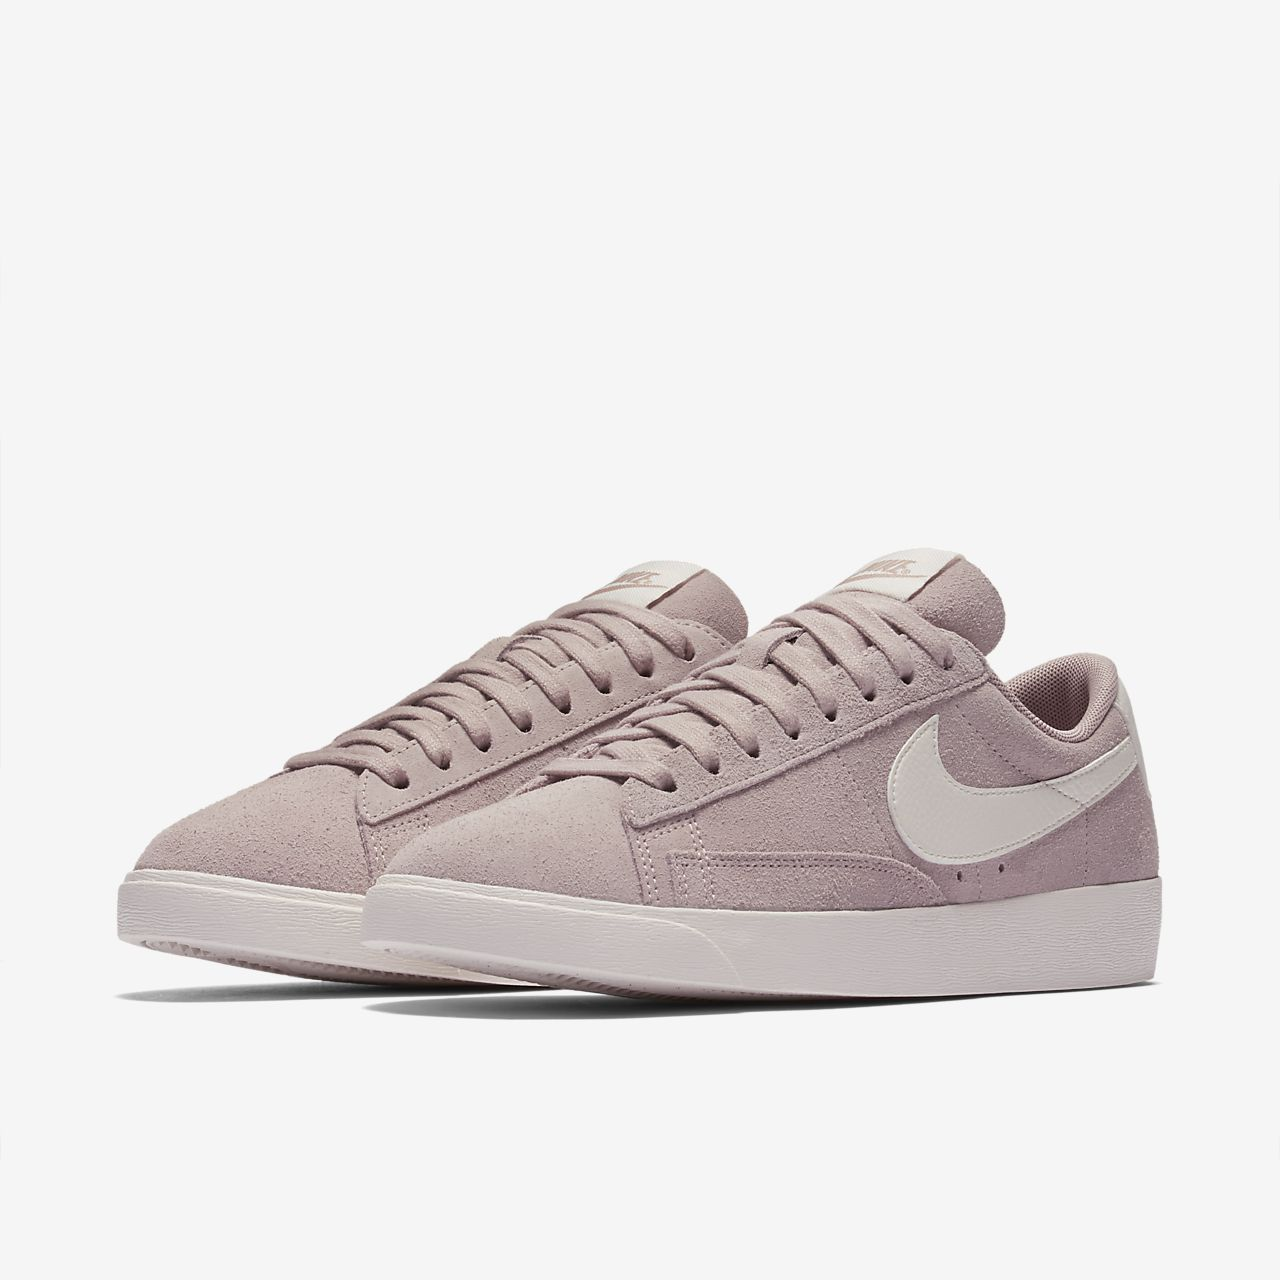 17db66afd29e6 Nike Blazer Low Suede Women s Shoe   Shoe-a-holic   Pinterest ...